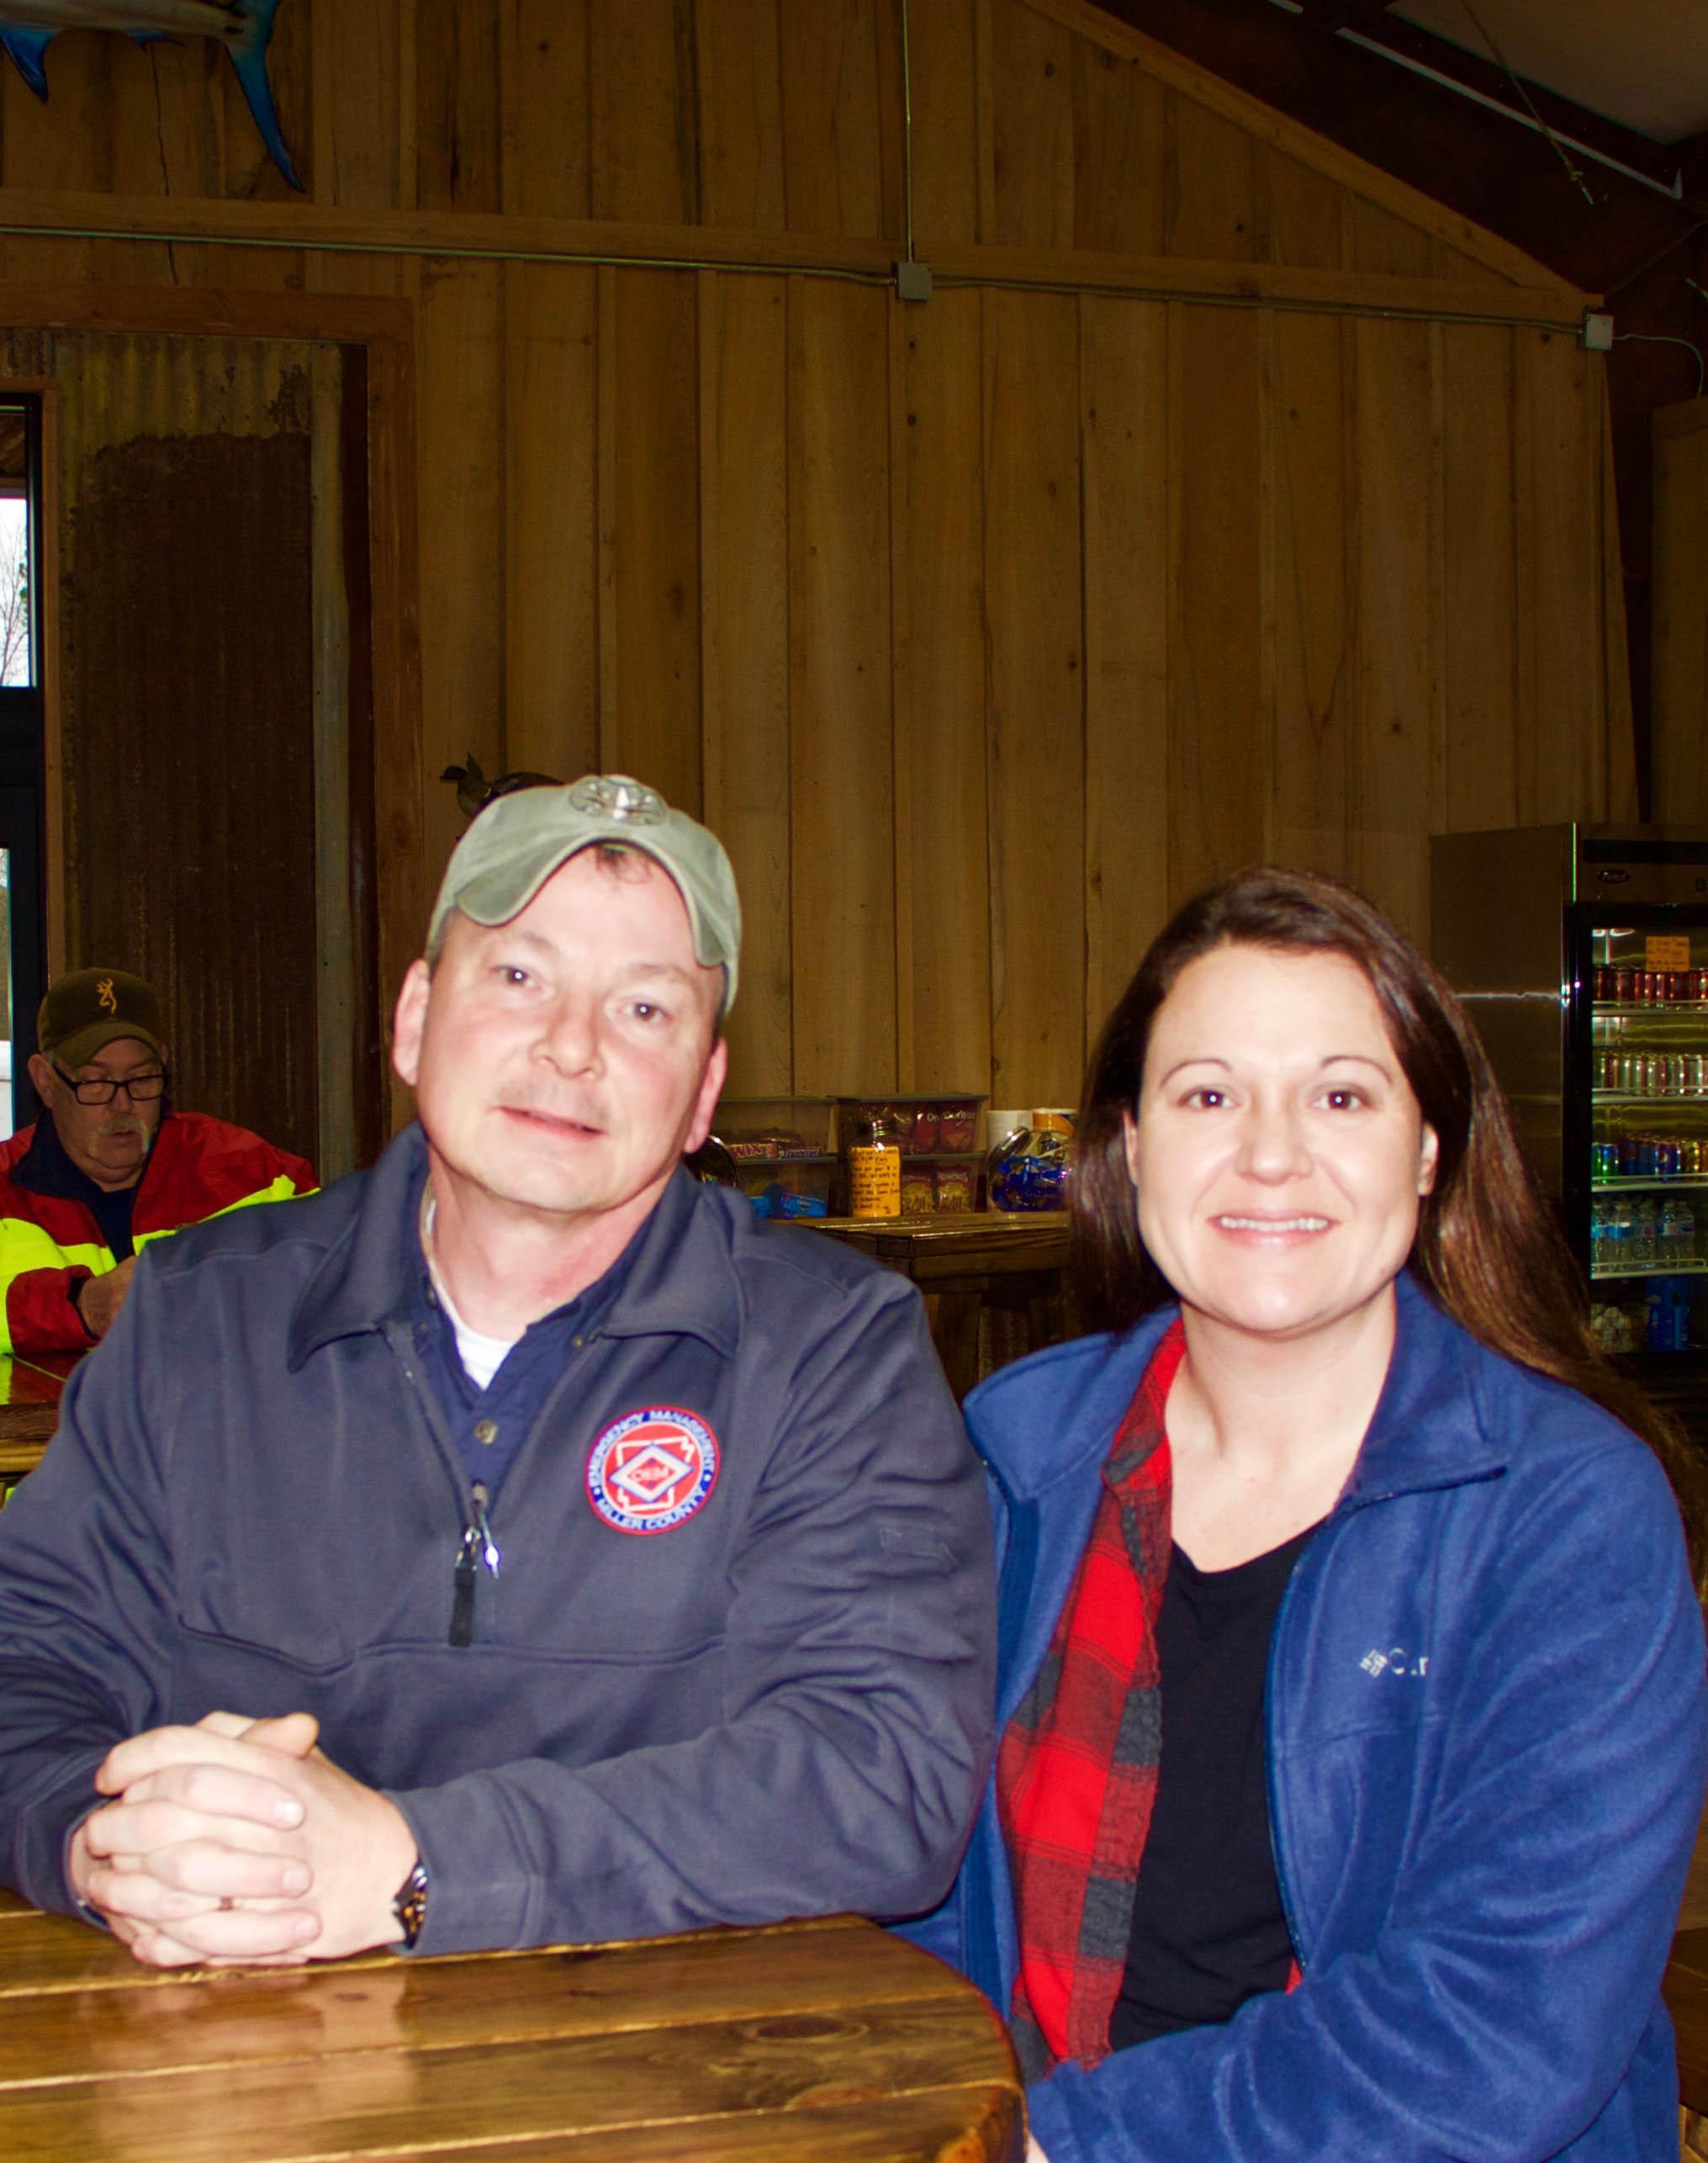 Miller County Office of Emergency Management Coordinator Joe Bennett and Texarkana Arkansas Police Department Sergeant Kristi Bennett